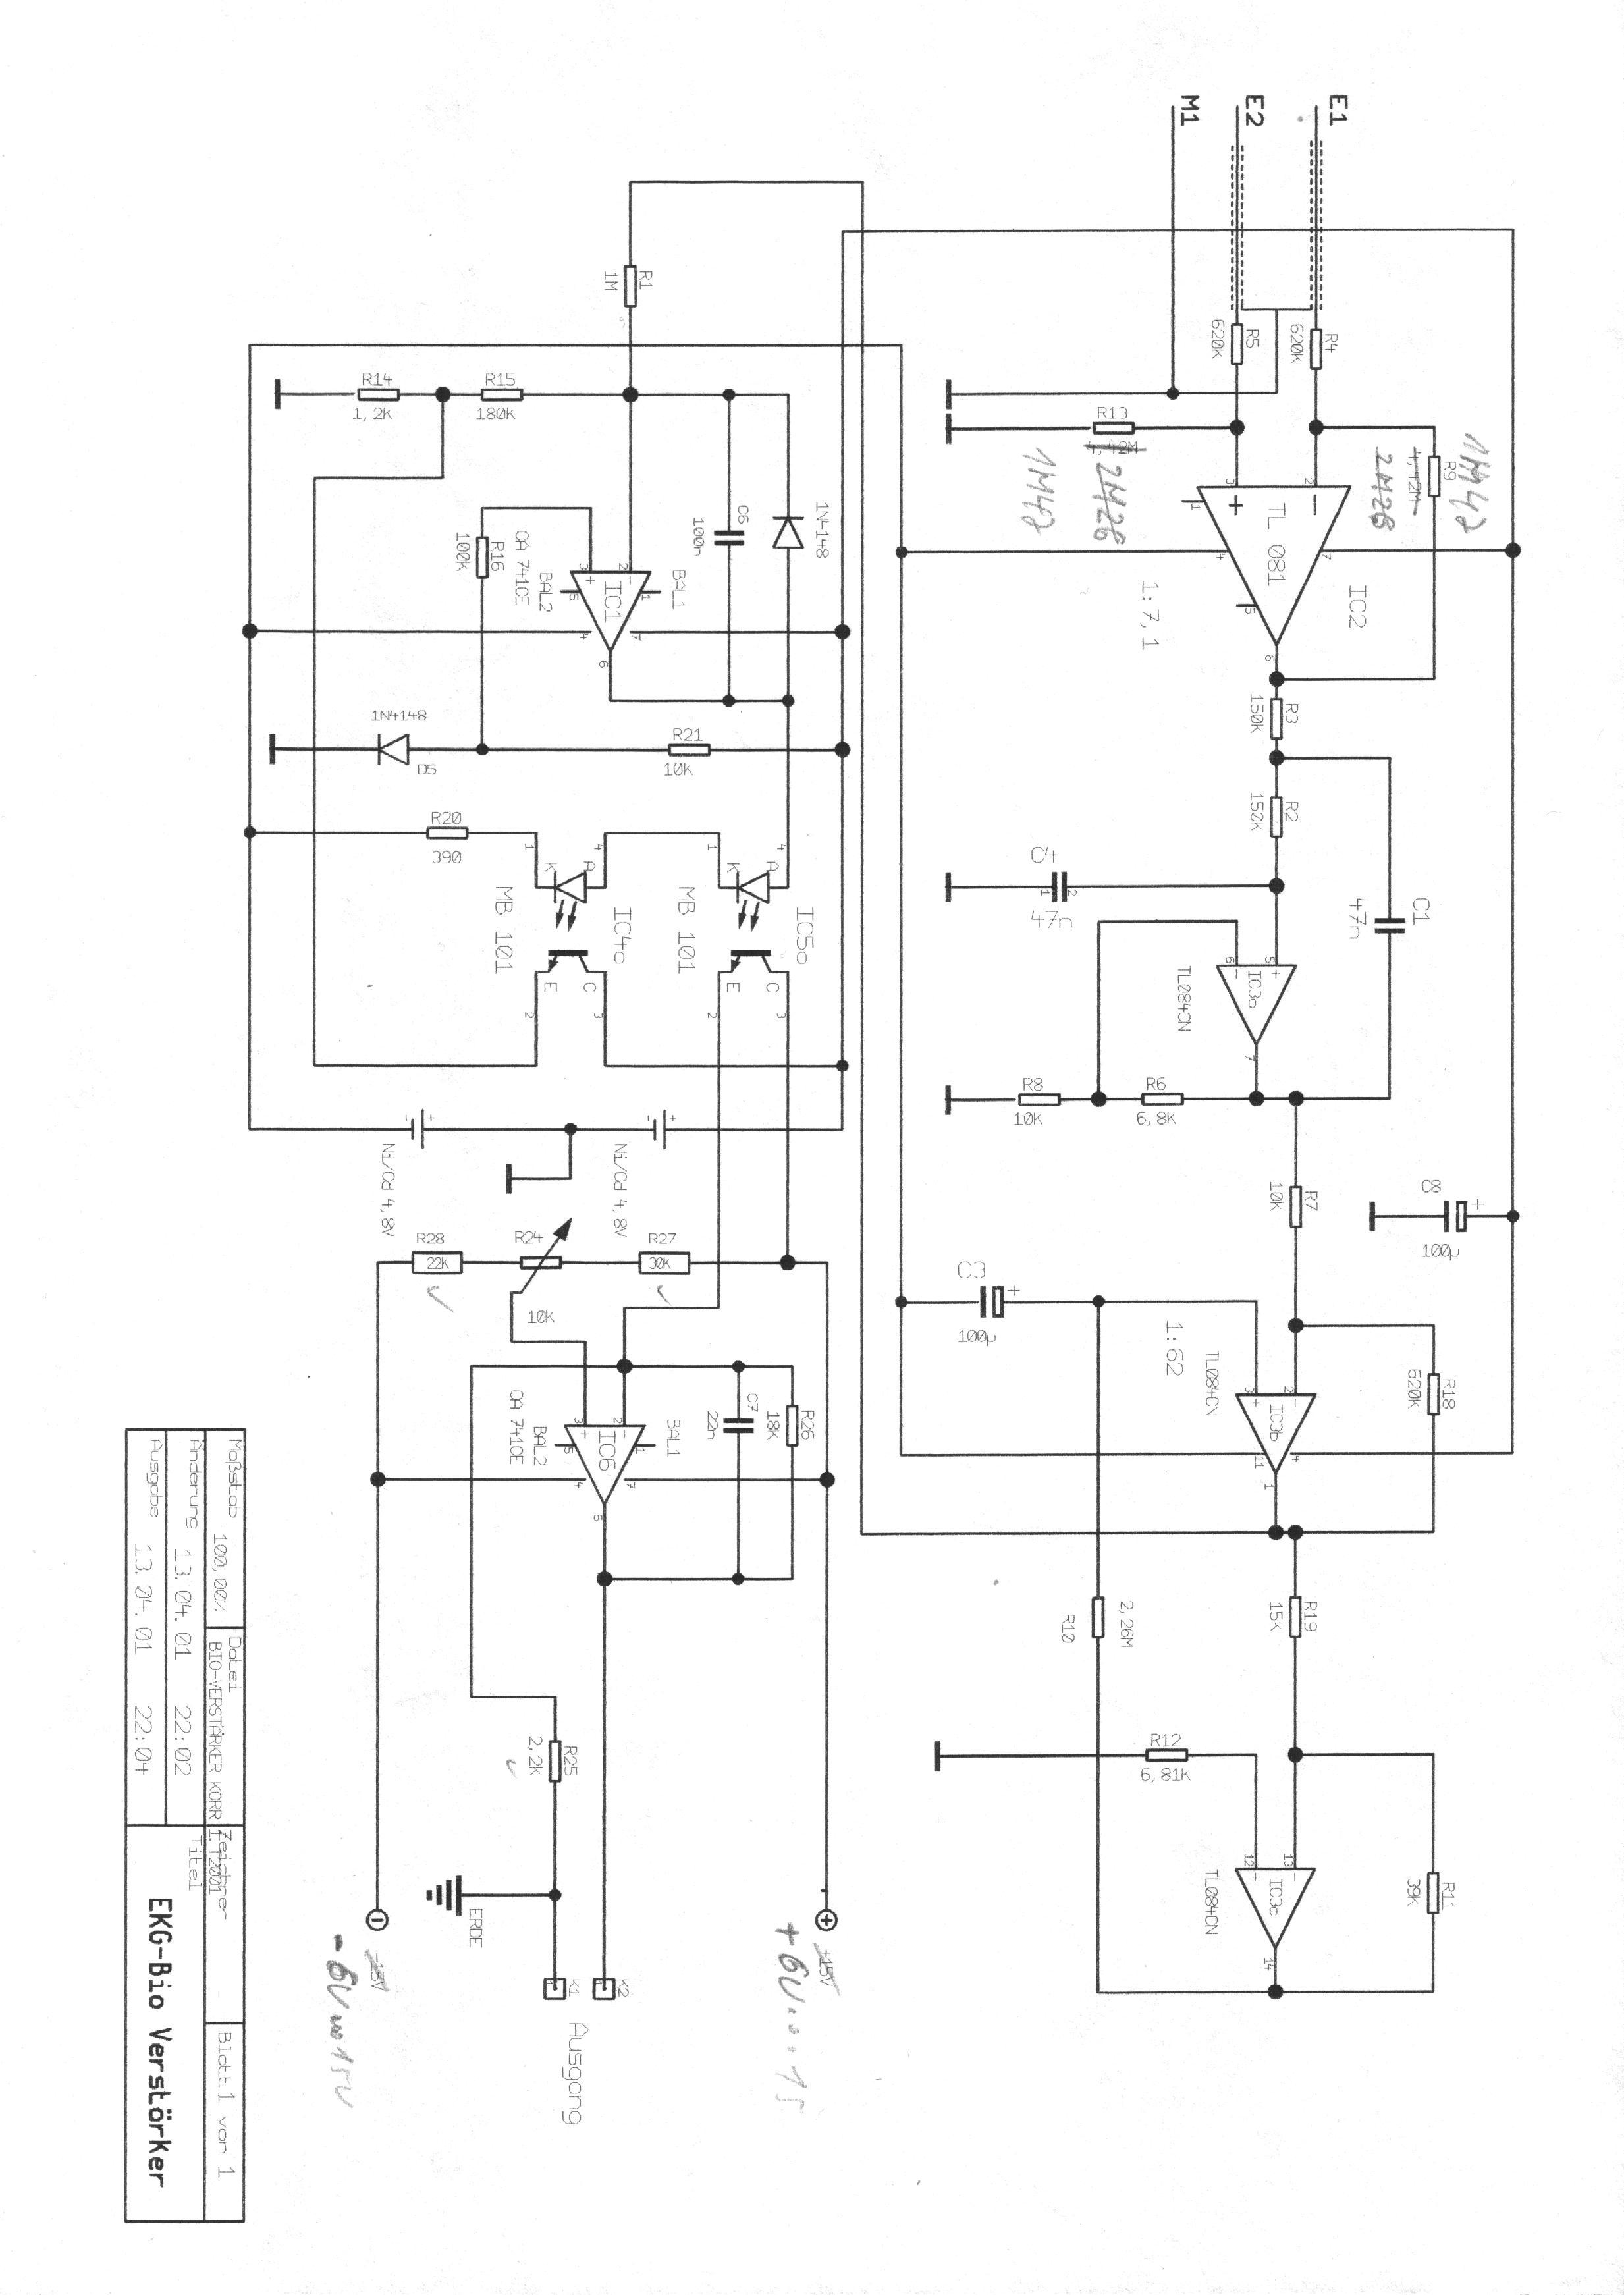 EKG Schaltung okay? - Mikrocontroller.net